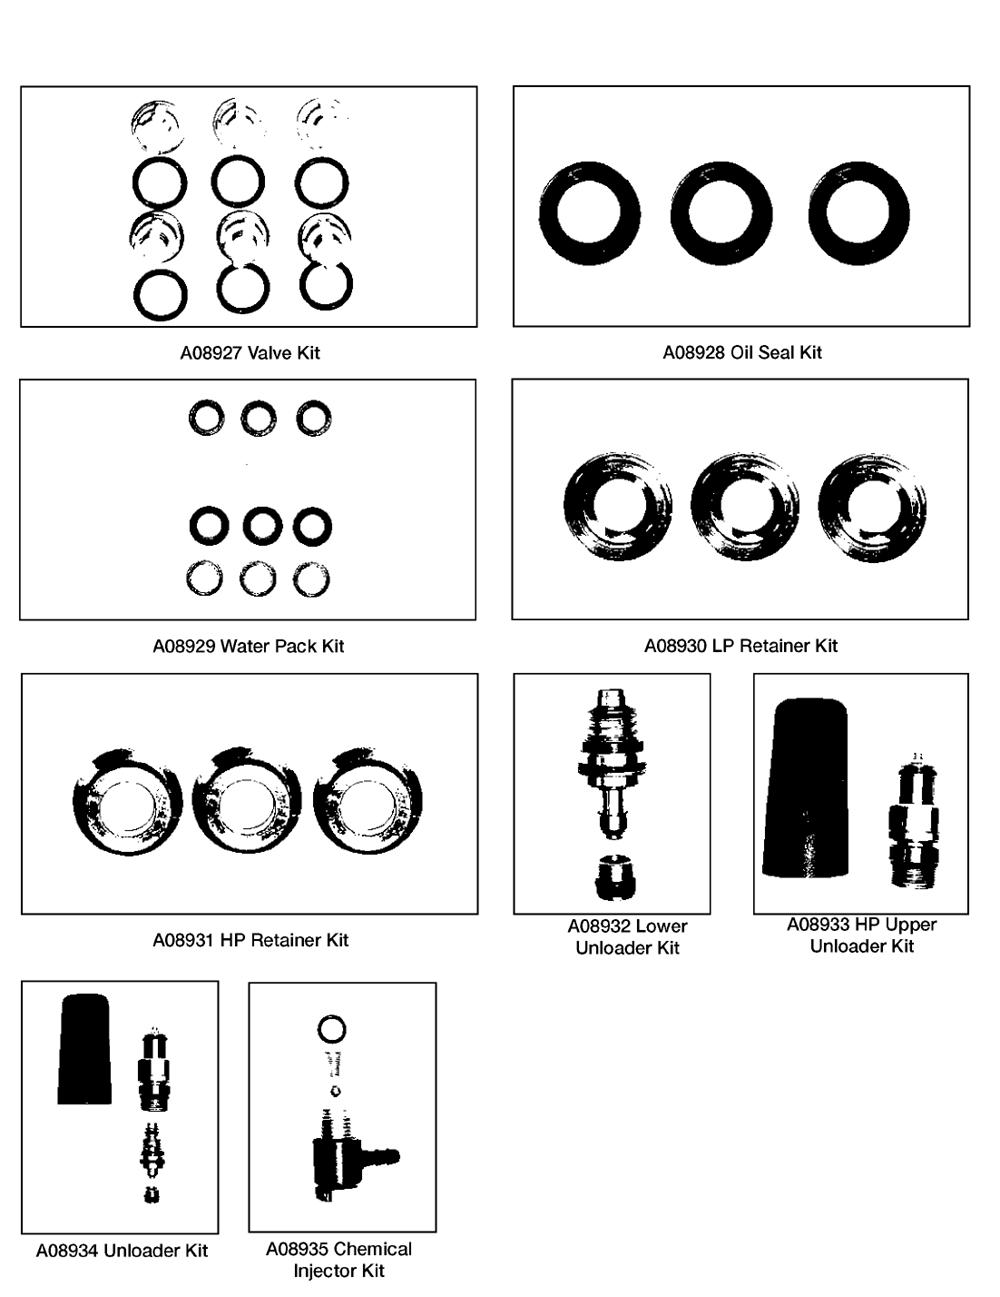 Dewalt Dp3750 Type 1 Parts List Dewalt Dp3750 Type 1